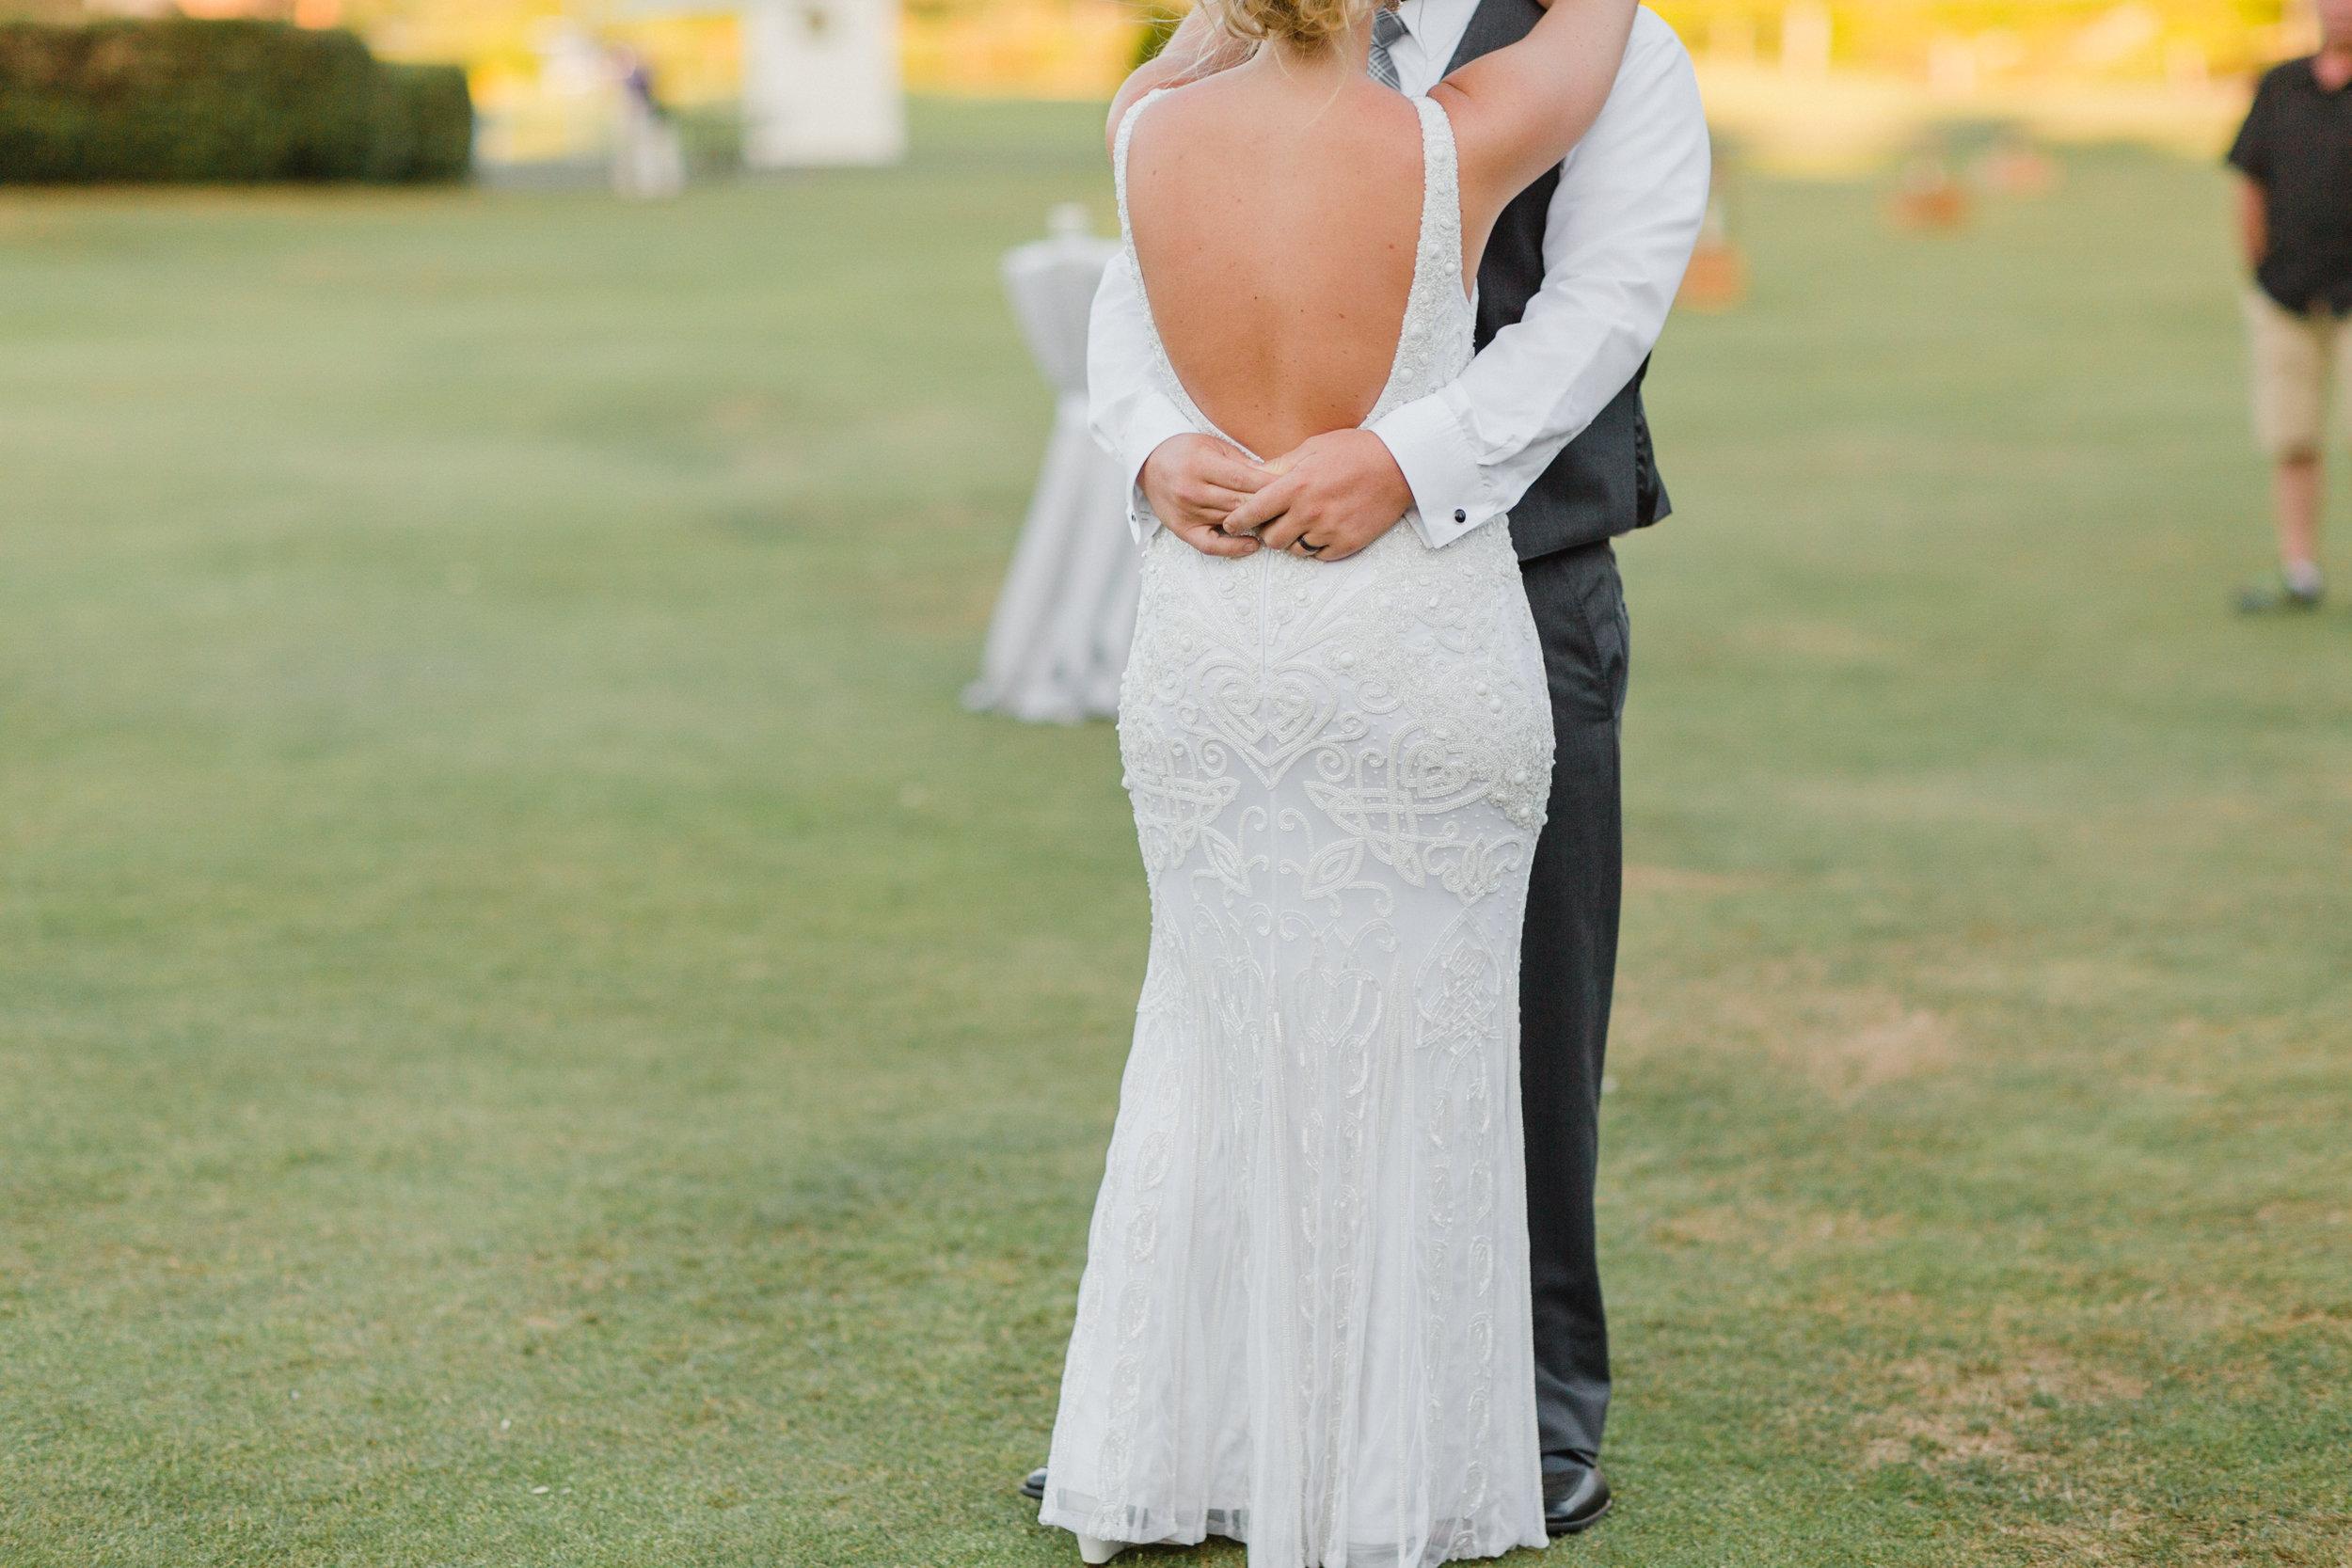 Rustic Wedding Decor - Raspberry Ridge Golf Course Wedding — The Overwhelmed Bride Wedding Blog